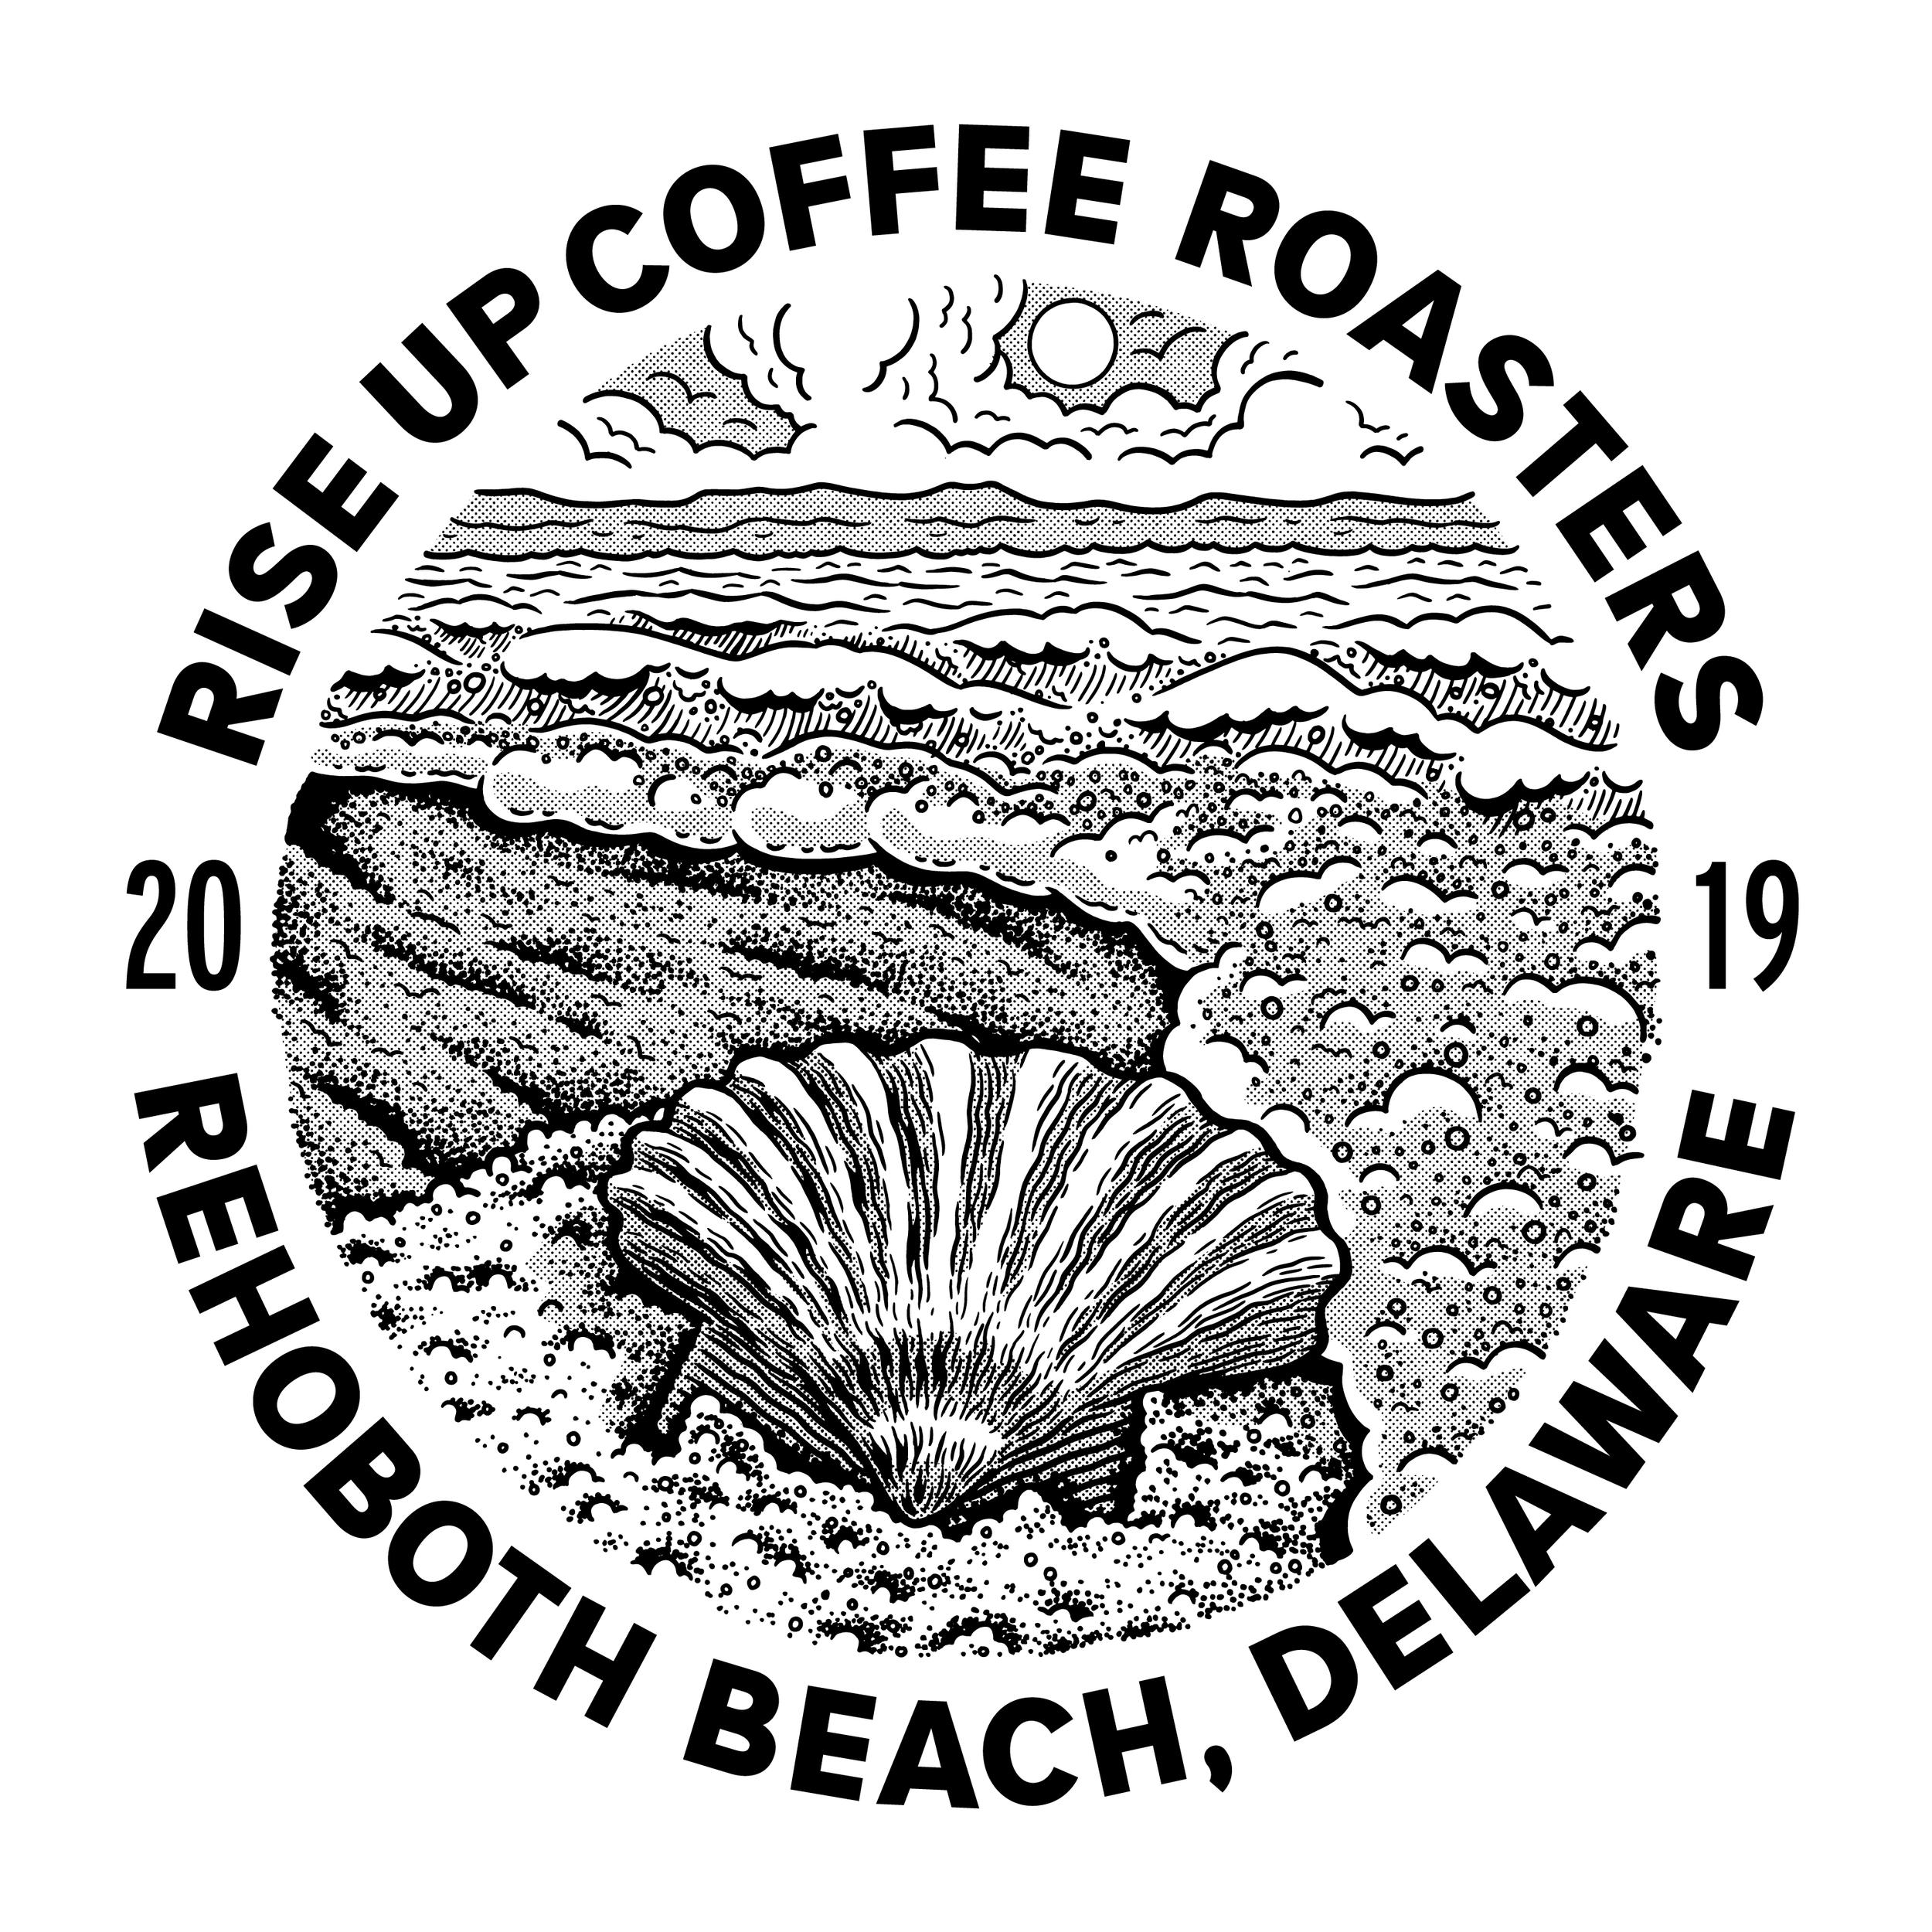 RUC_RehobothBeach_Daytime_r1.png